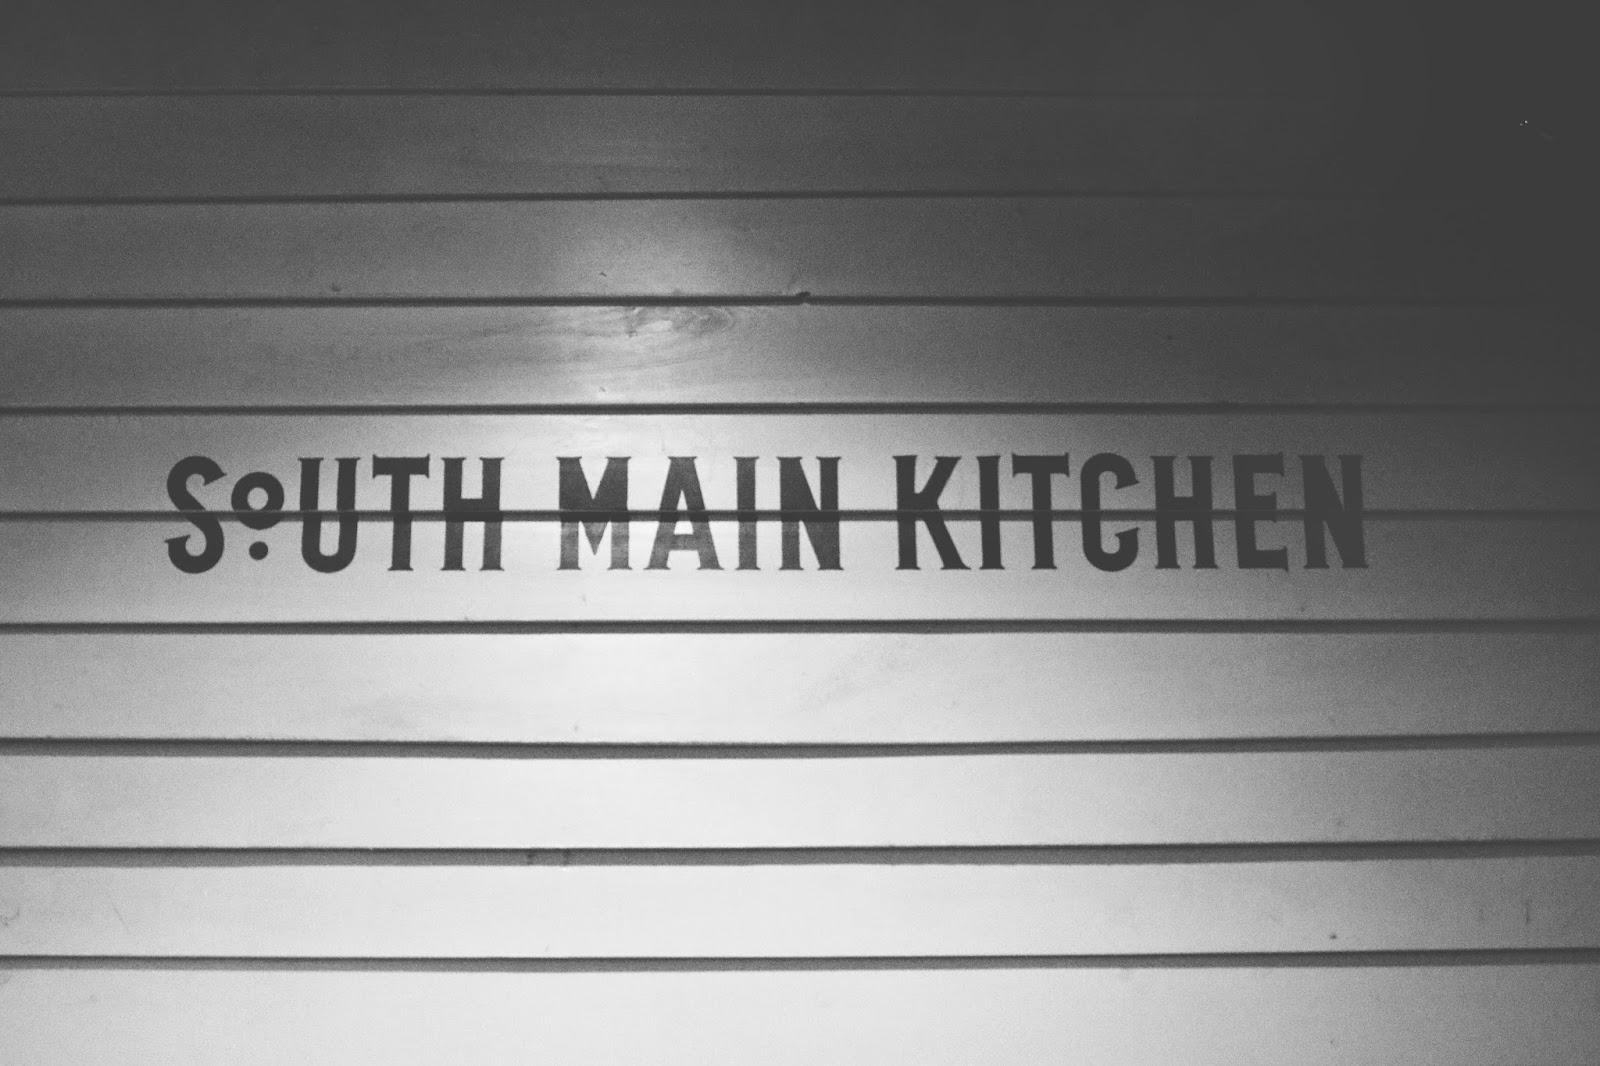 Local Eats: South Main Kitchen, Alpharetta - Chanel Moving Forward